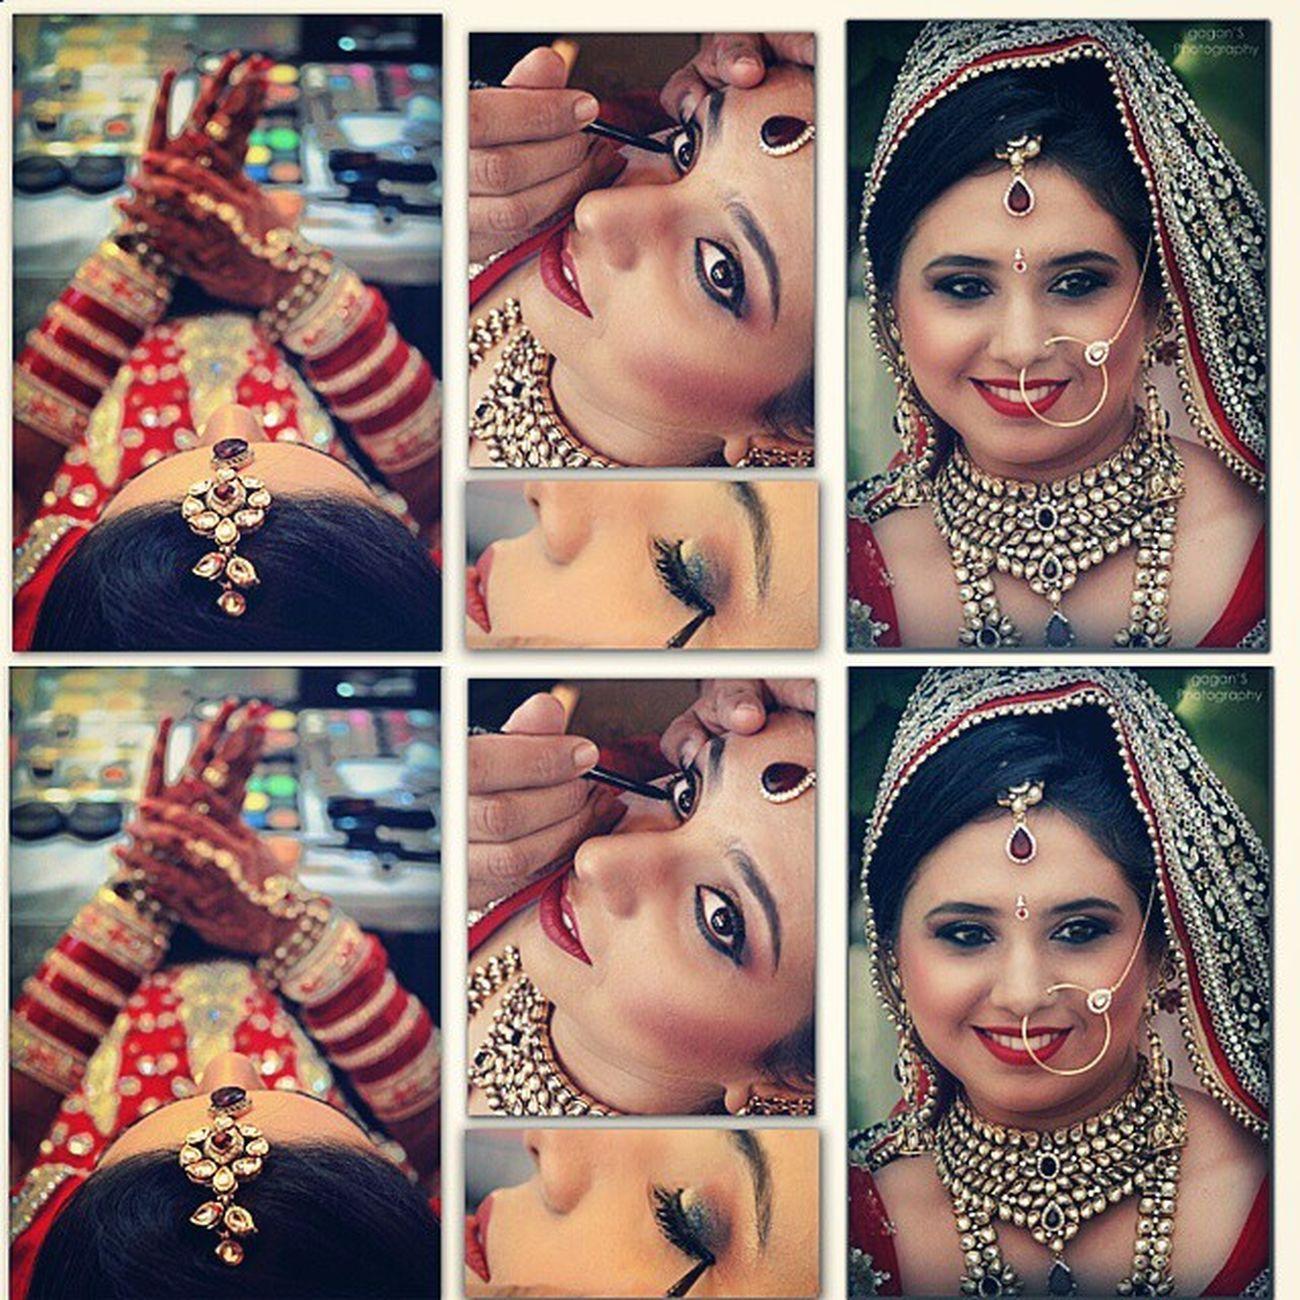 Gagans_photography Wedding Portfolios Instachandigarh Diwali2014 Perfect Bride